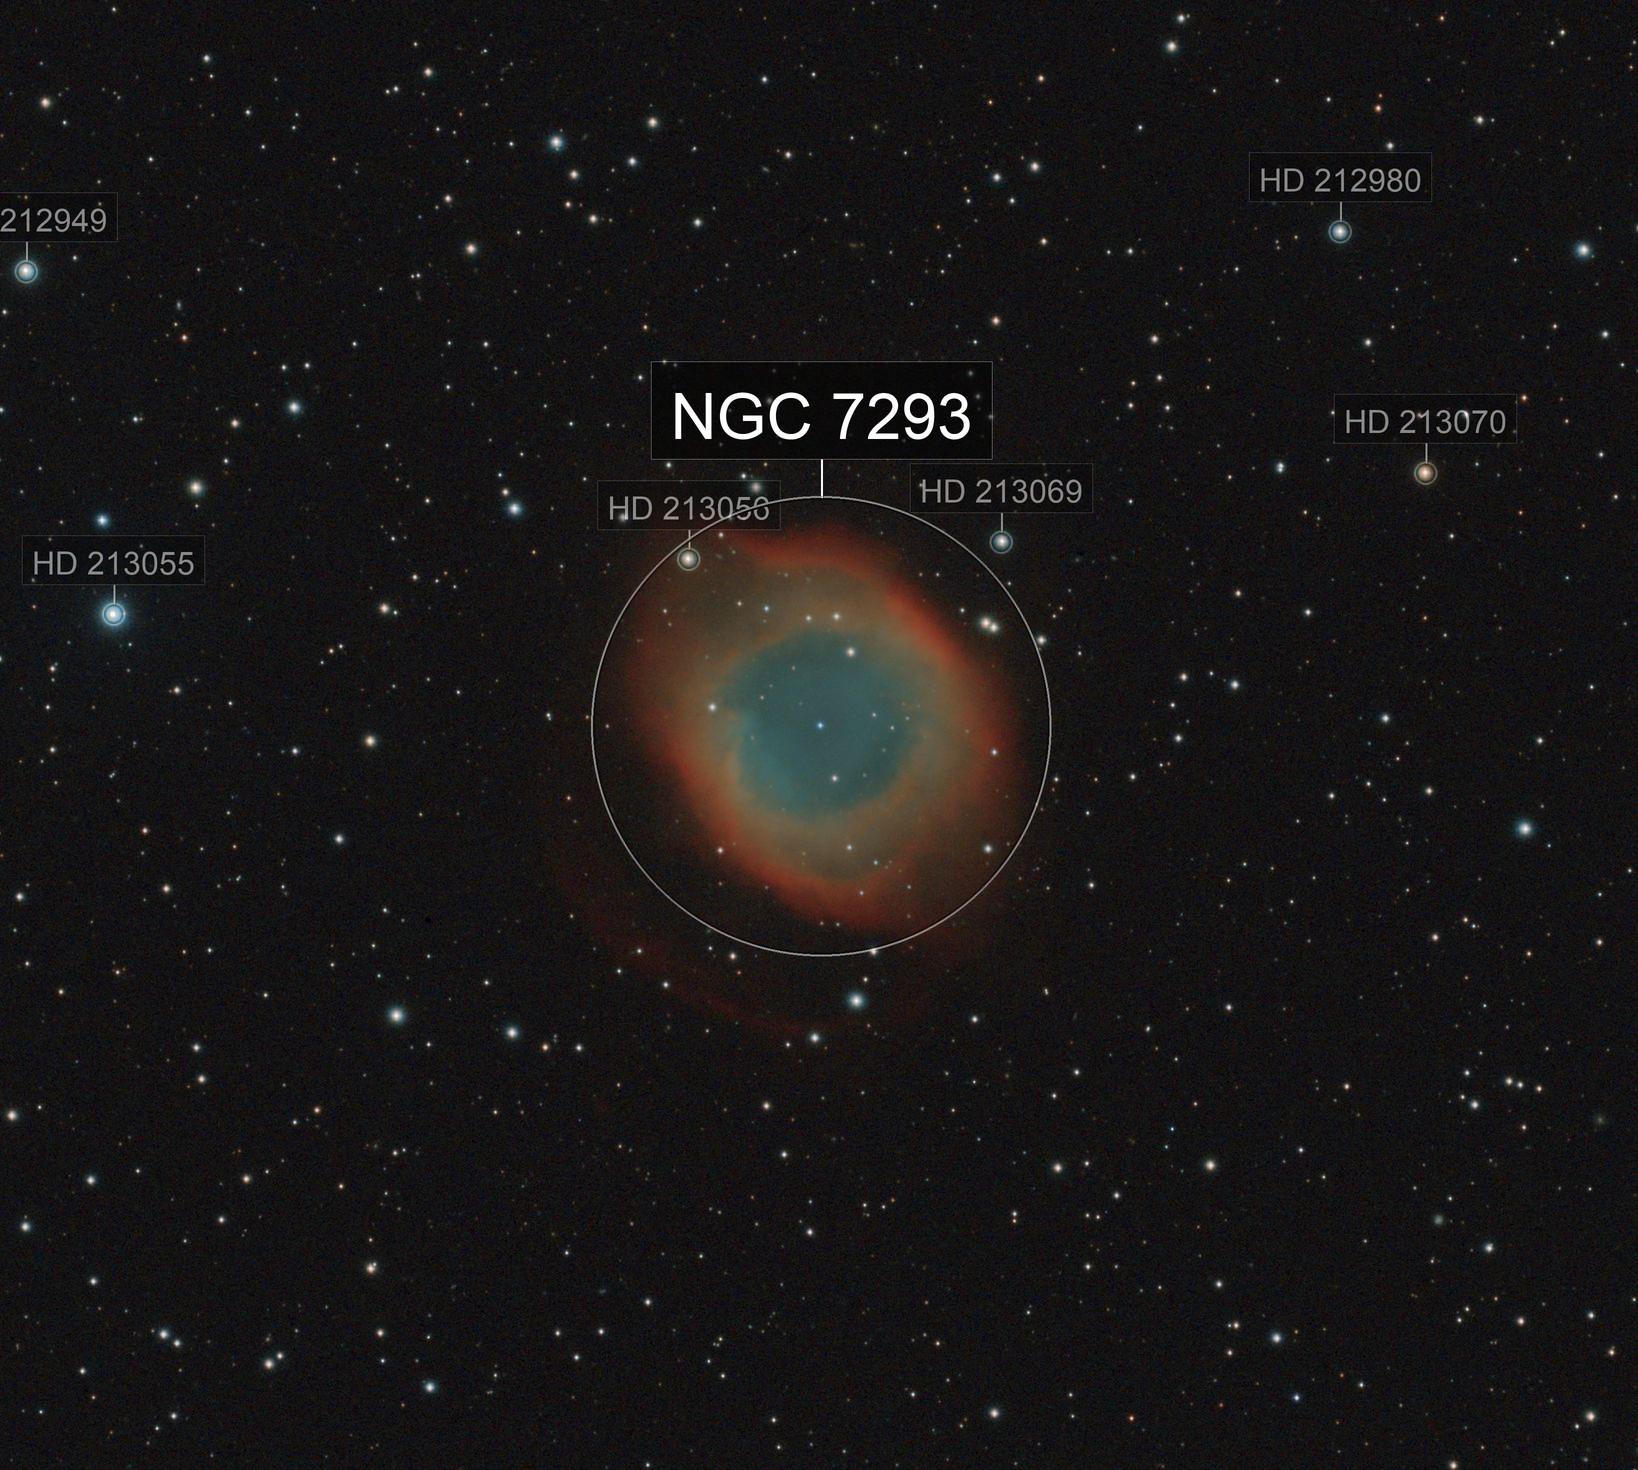 Helix Nebula - 1 hour integration